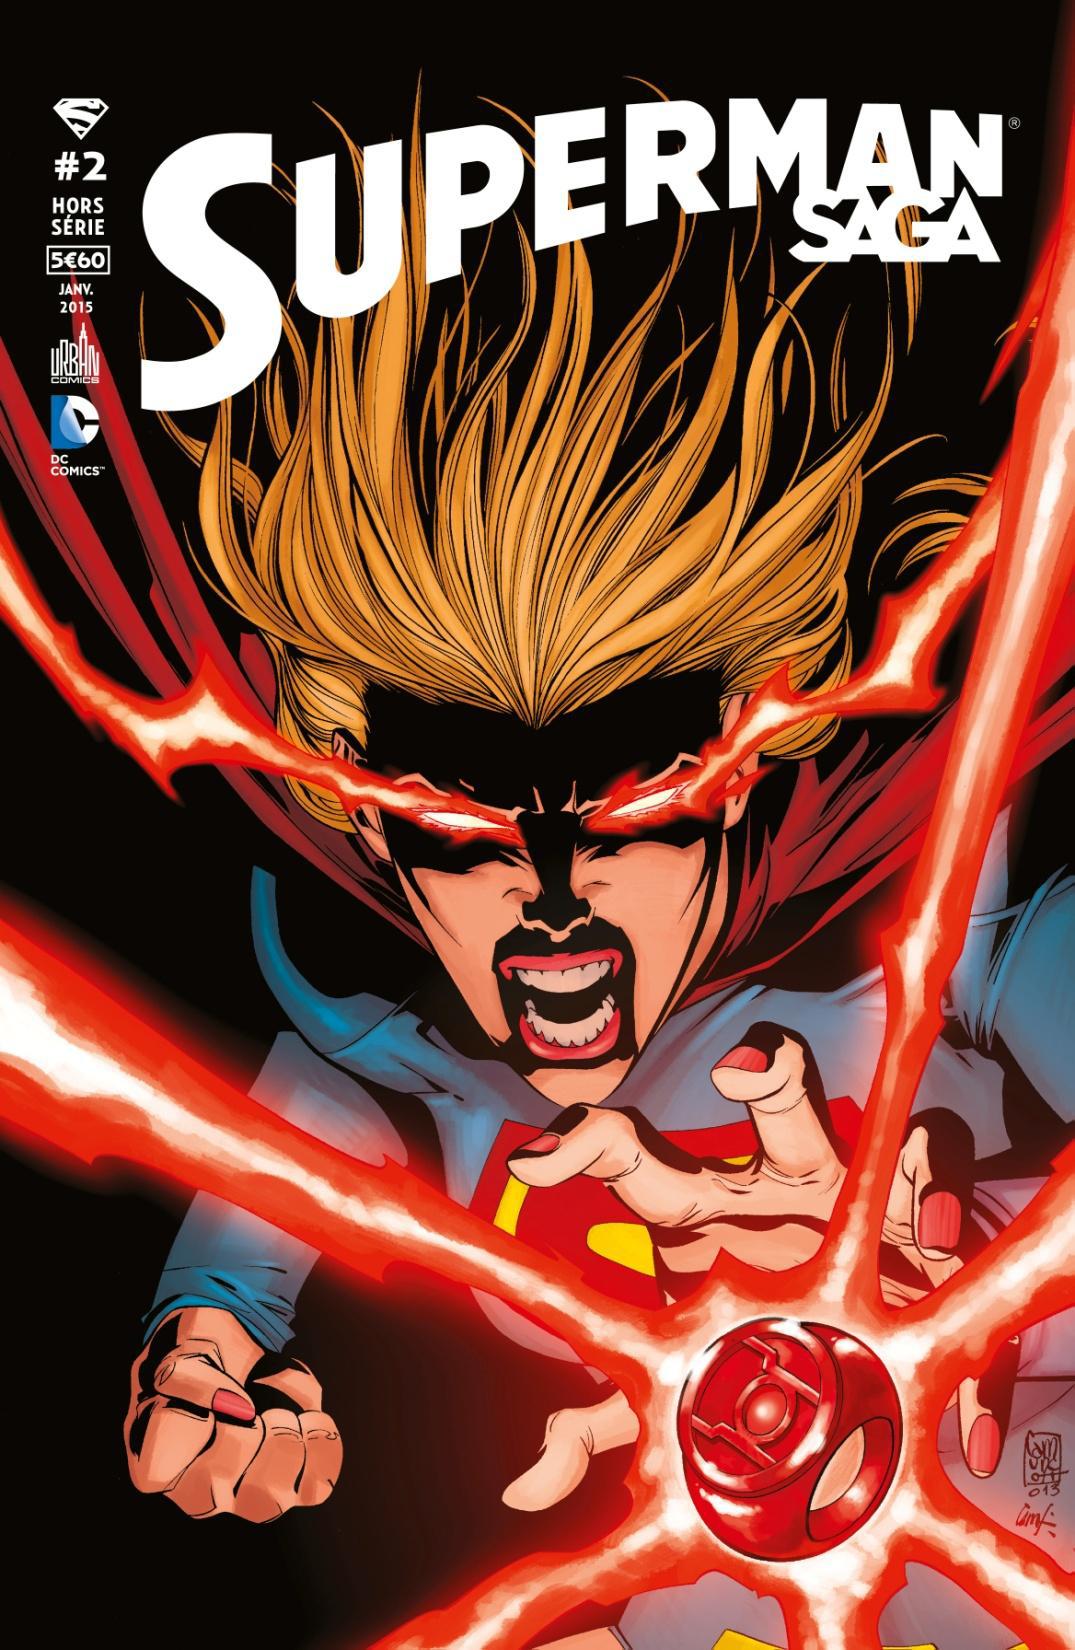 SUPERMAN SAGA HORS-SÉRIE #2